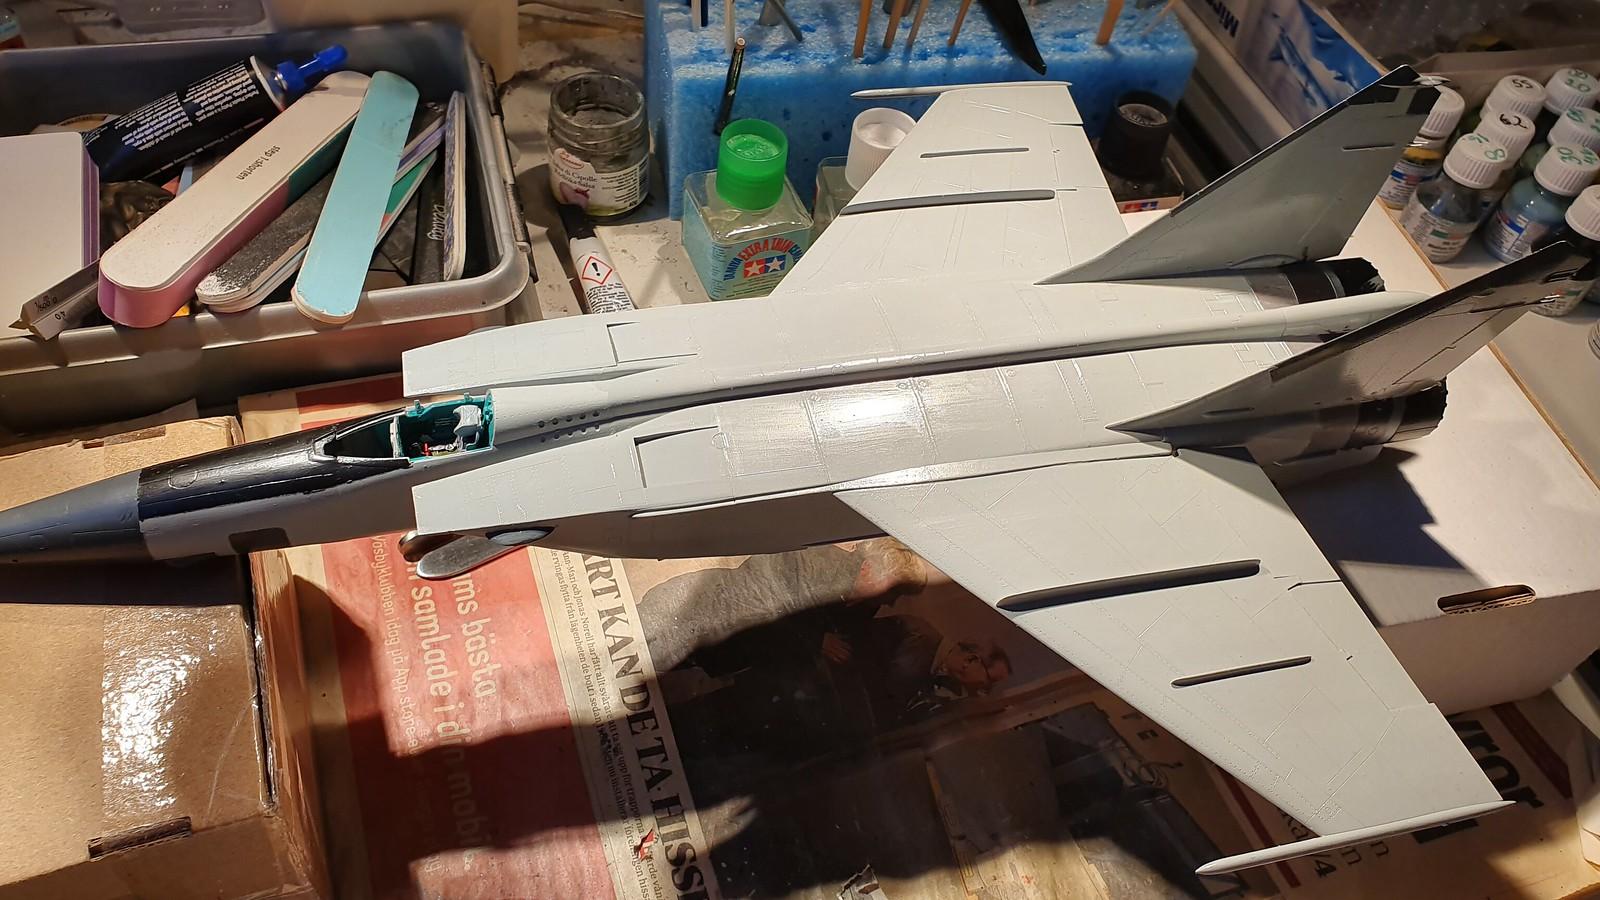 MiG-25BM Iraqi Air Force 1988 - ICM/Revell 1/48 + extra - Färdig! - Sida 7 48914336118_ab94d6d2b7_h